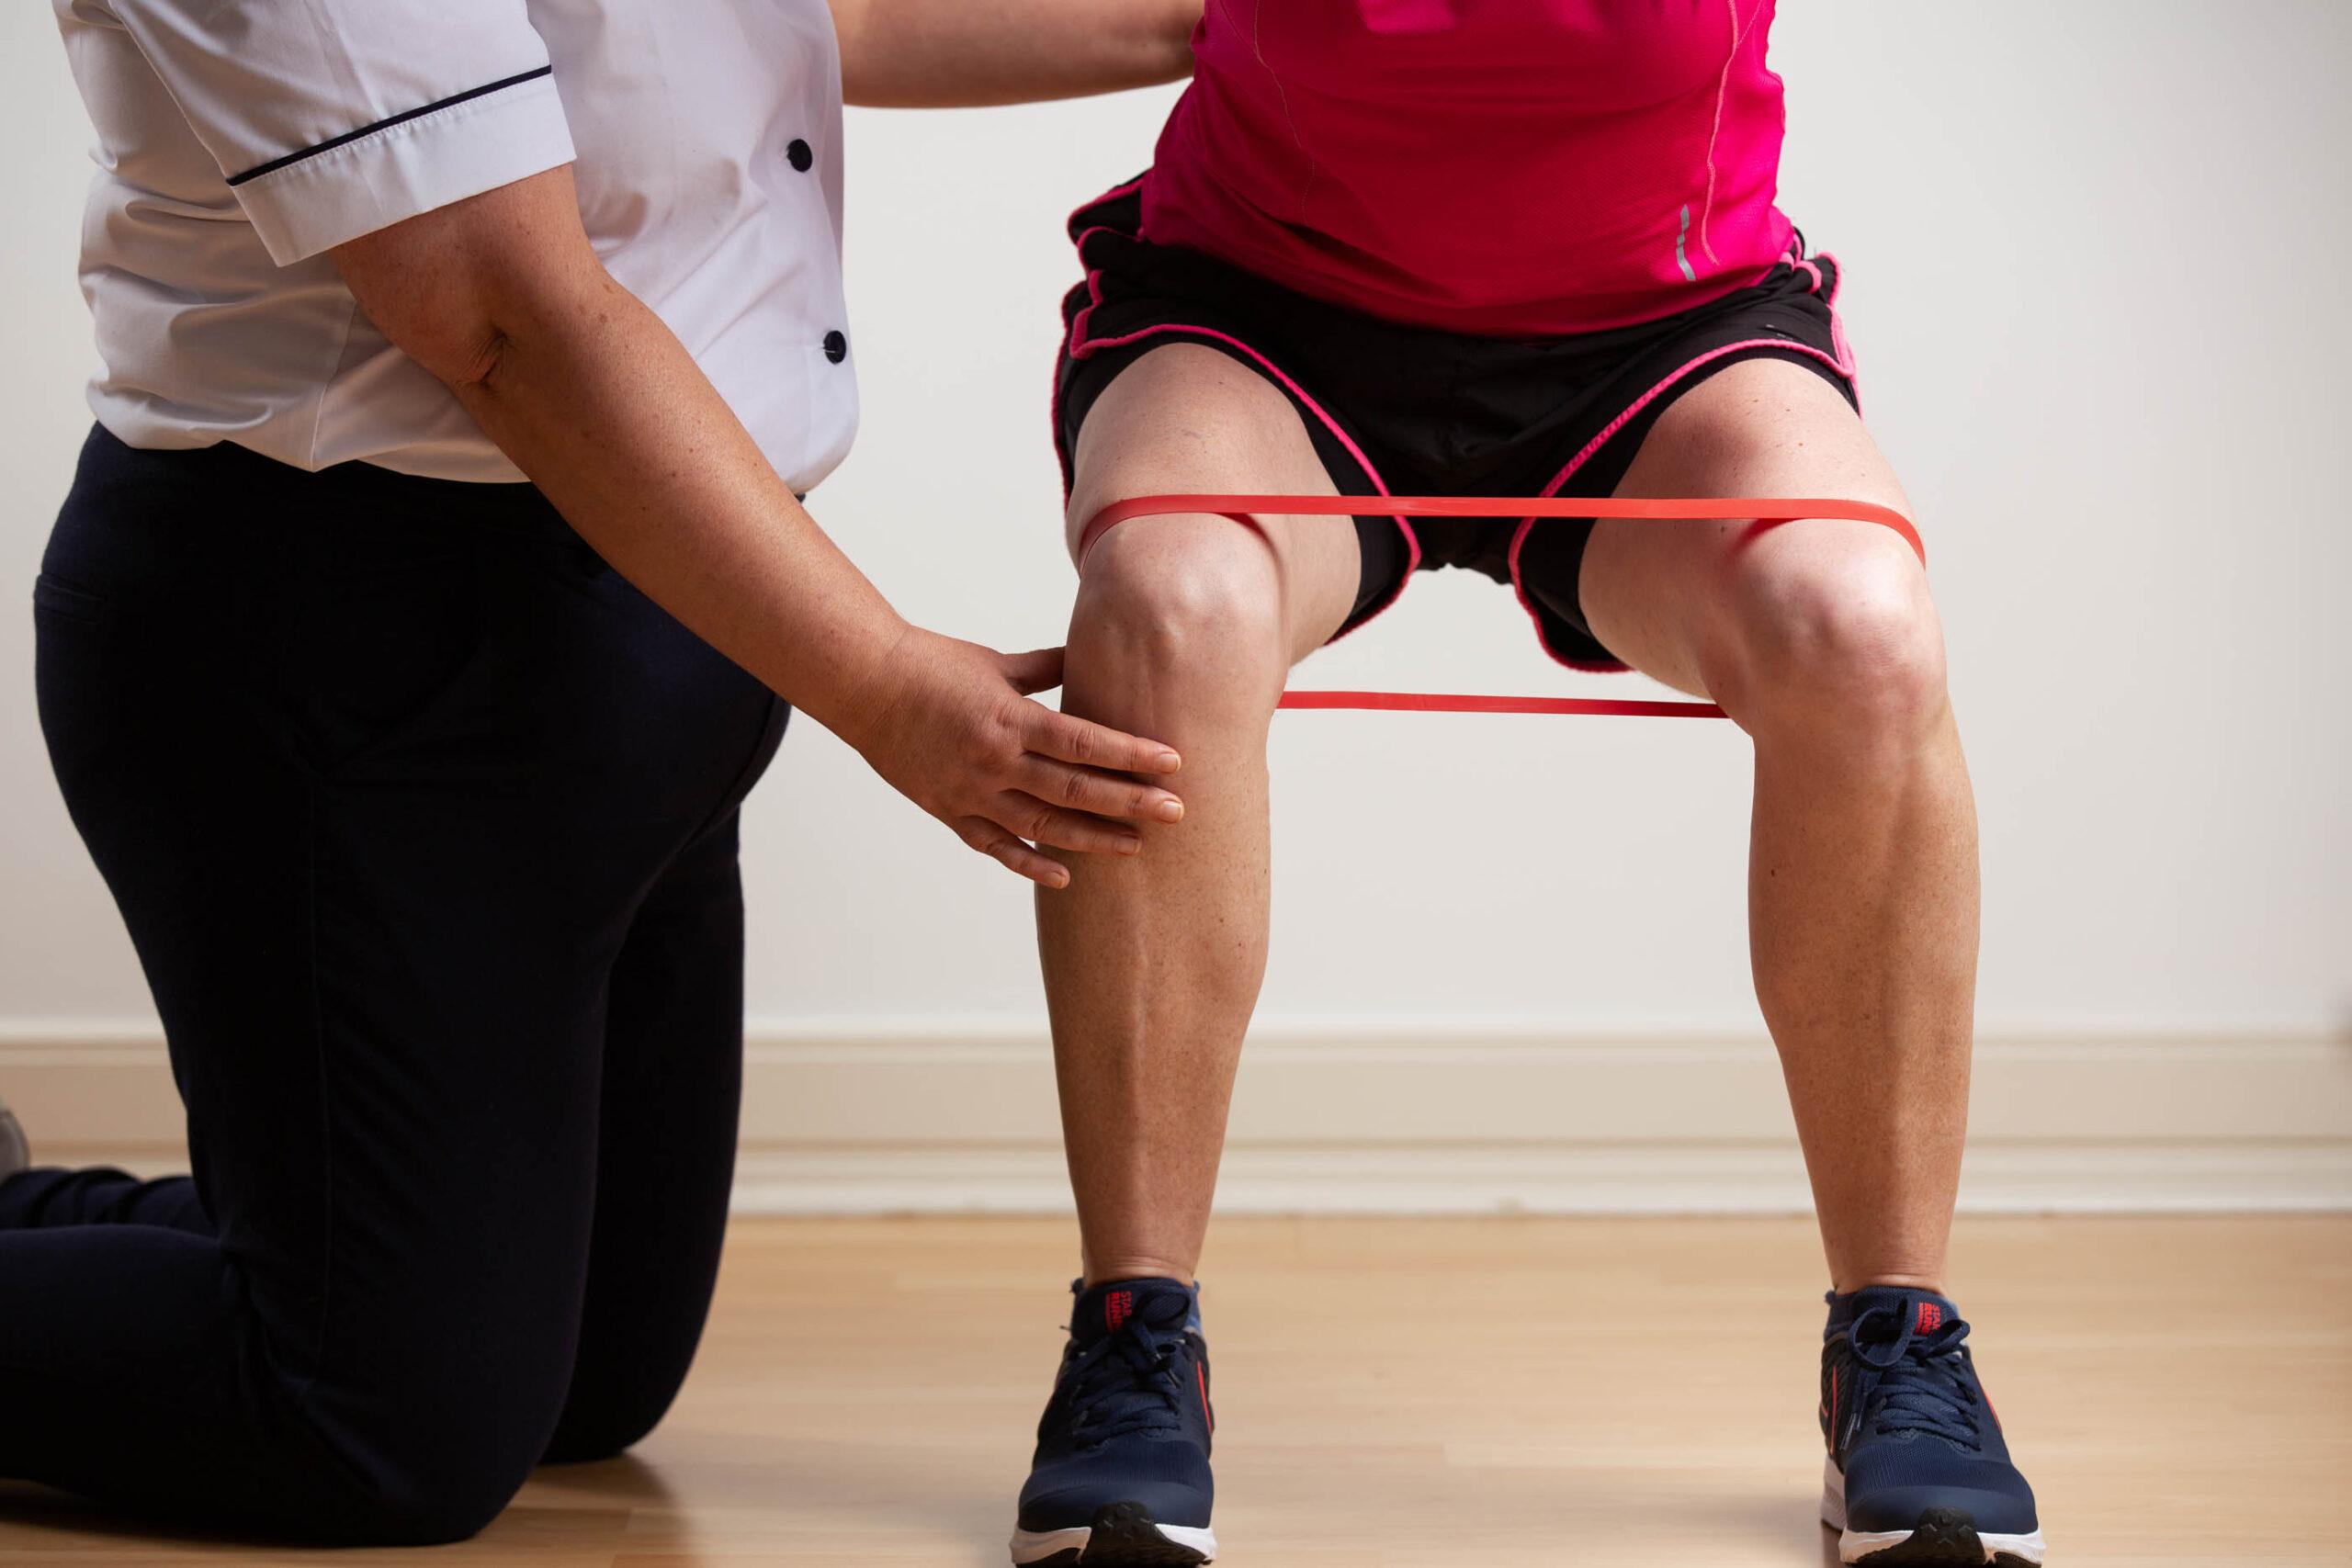 Pelvic Exercises Photo